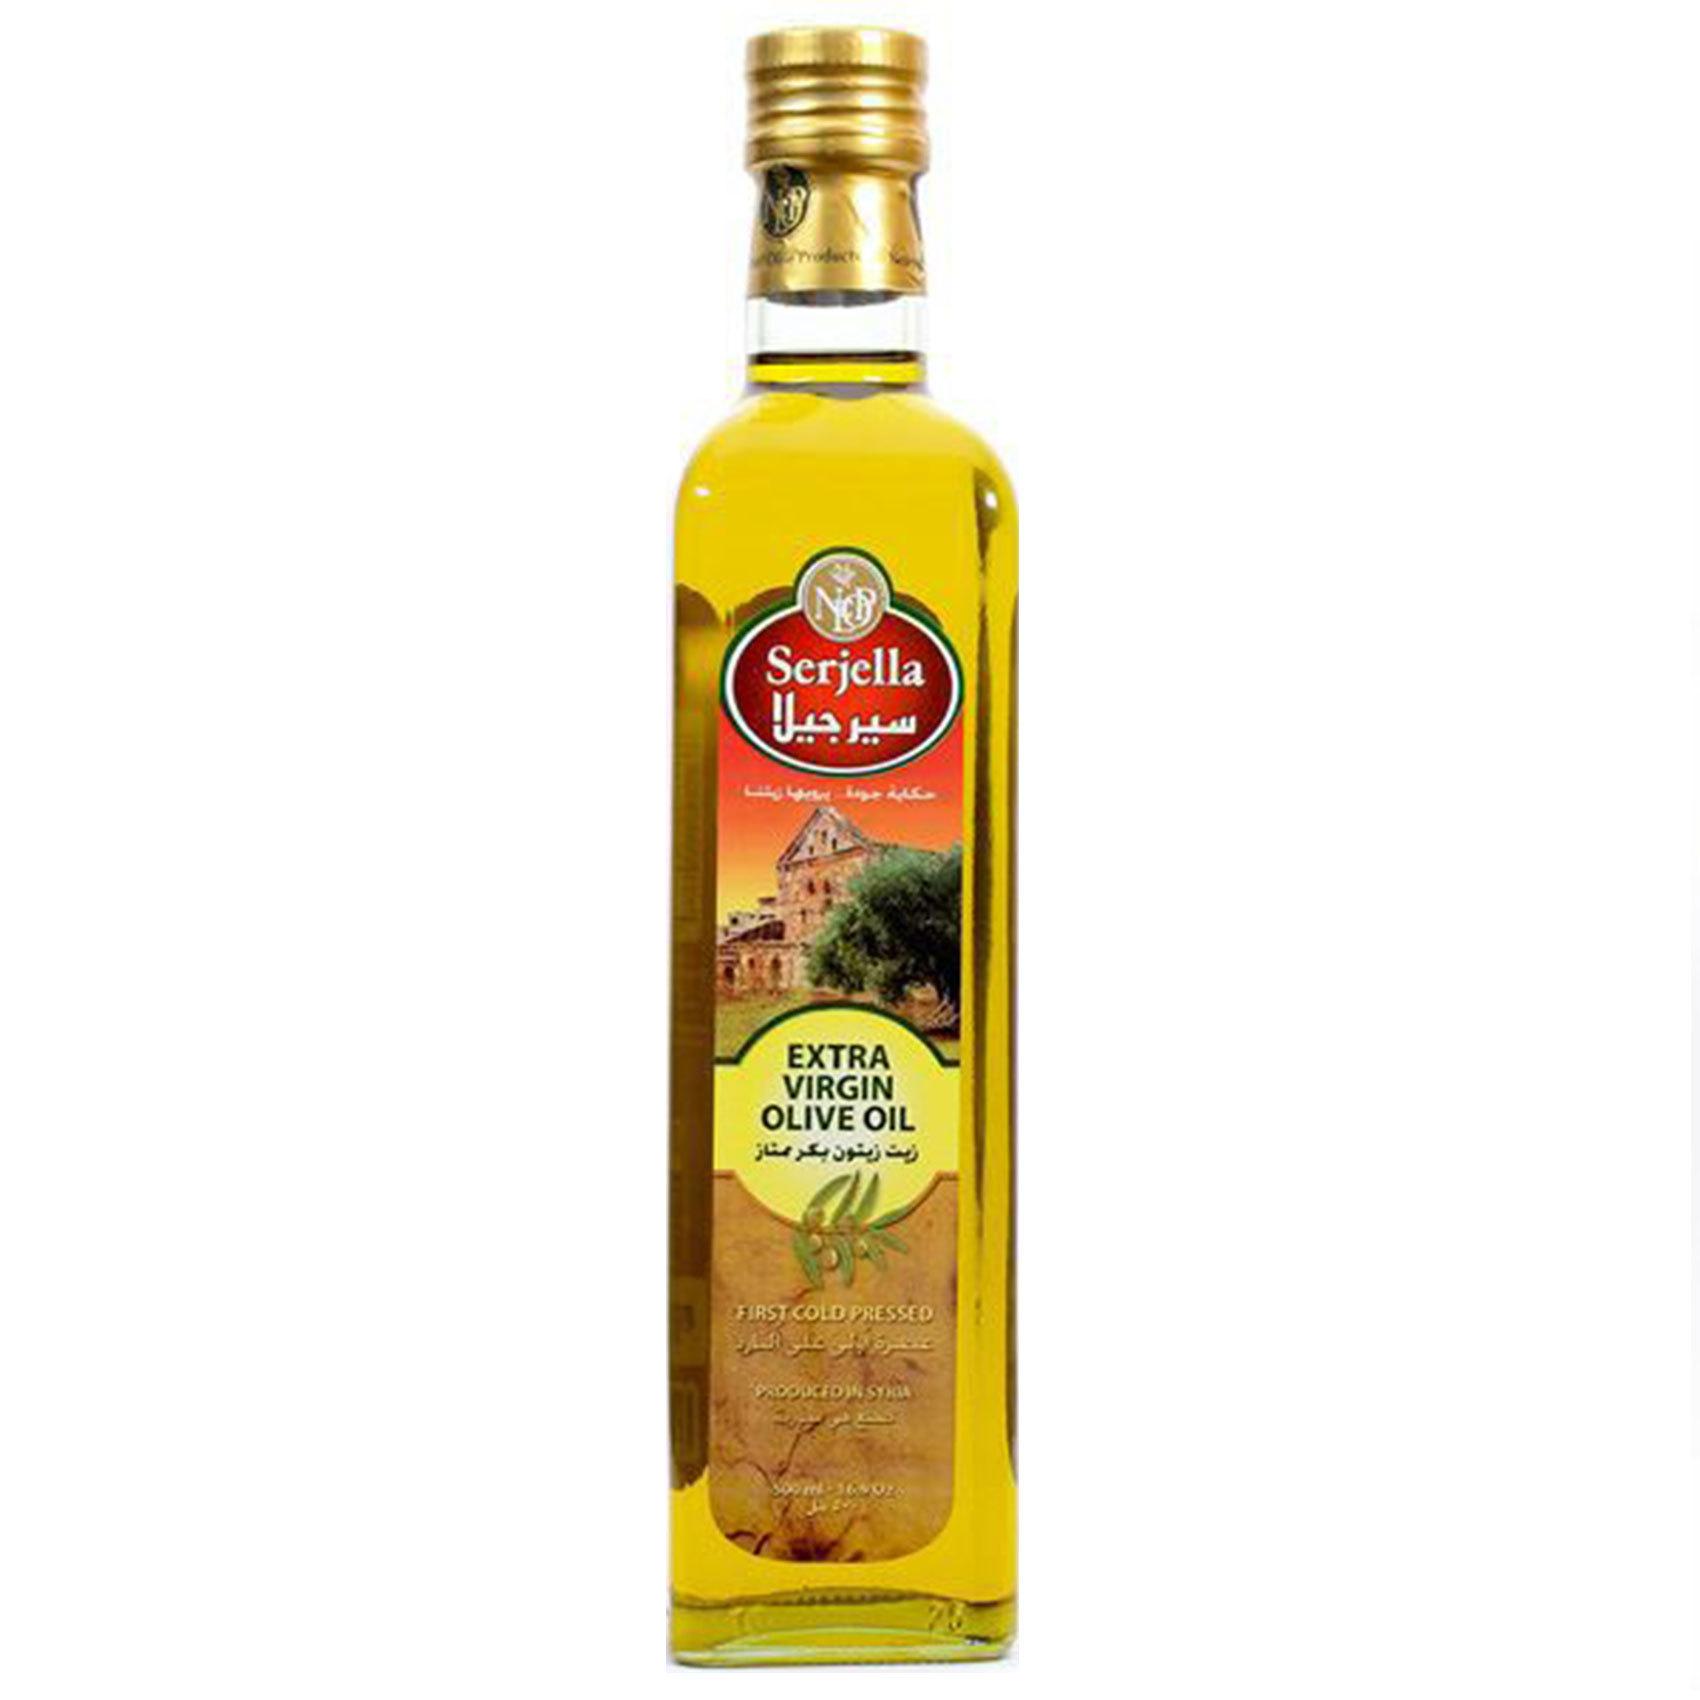 SERJELLA OLIVE OIL EXT VIRGIN 500ML